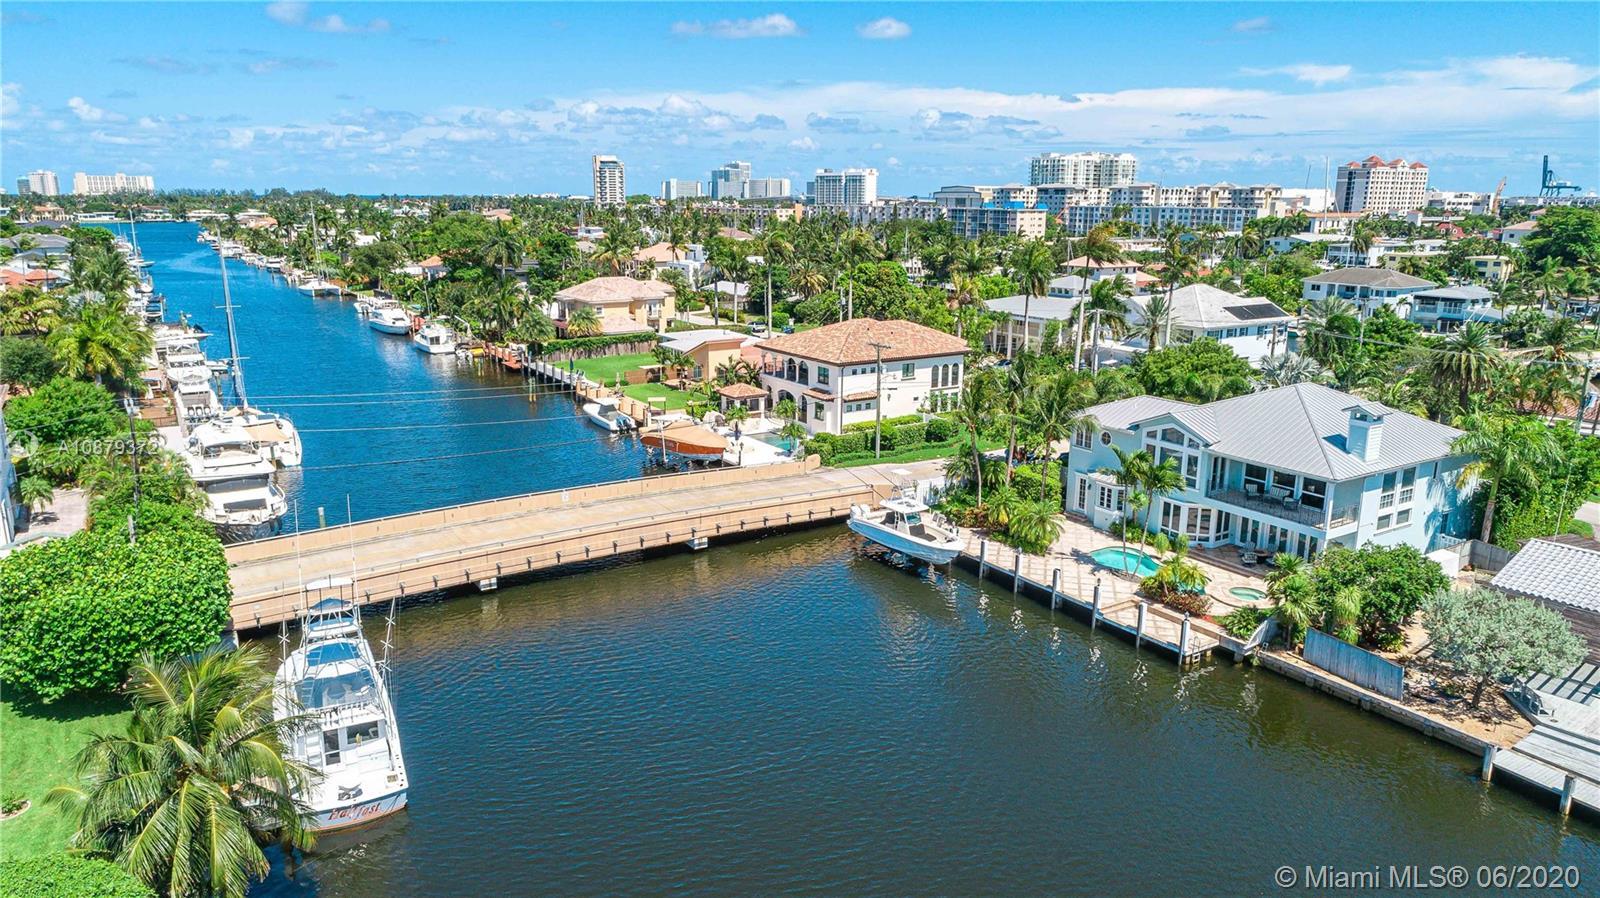 Lauderdale Harbors # - 05 - photo